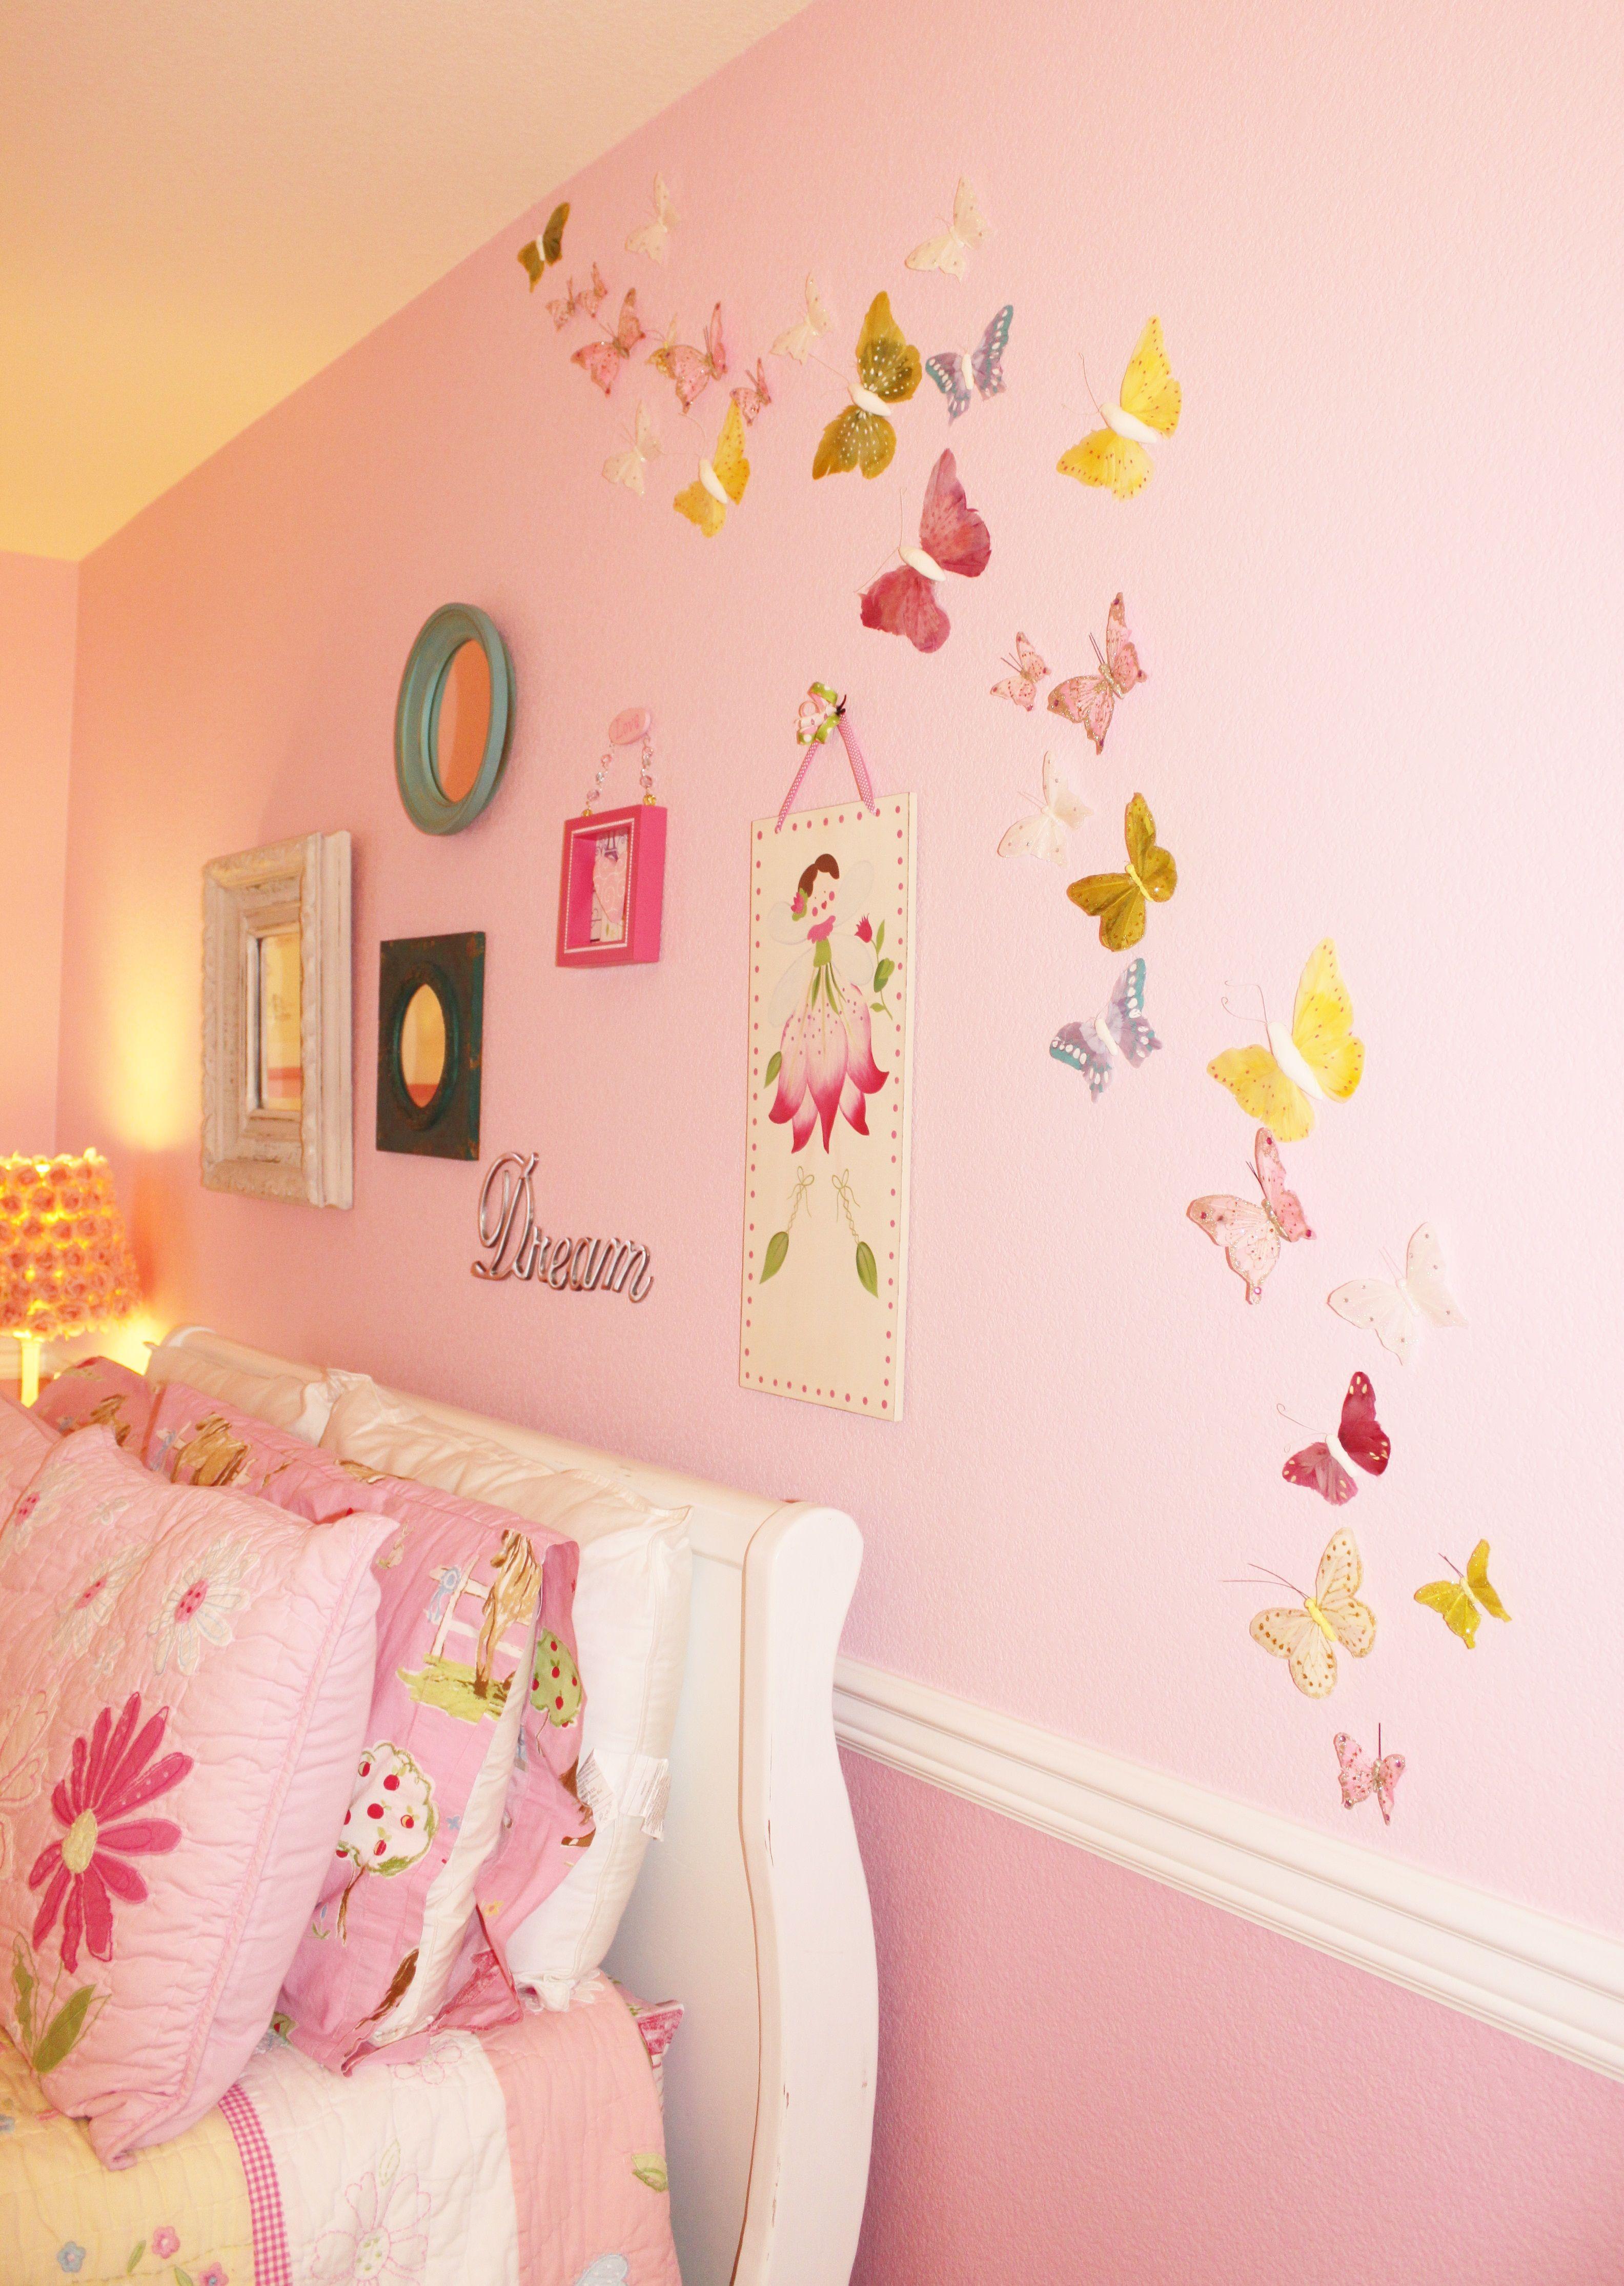 Pin By Lara Mark On Little Girls Bedroom By Lara Mark Designs